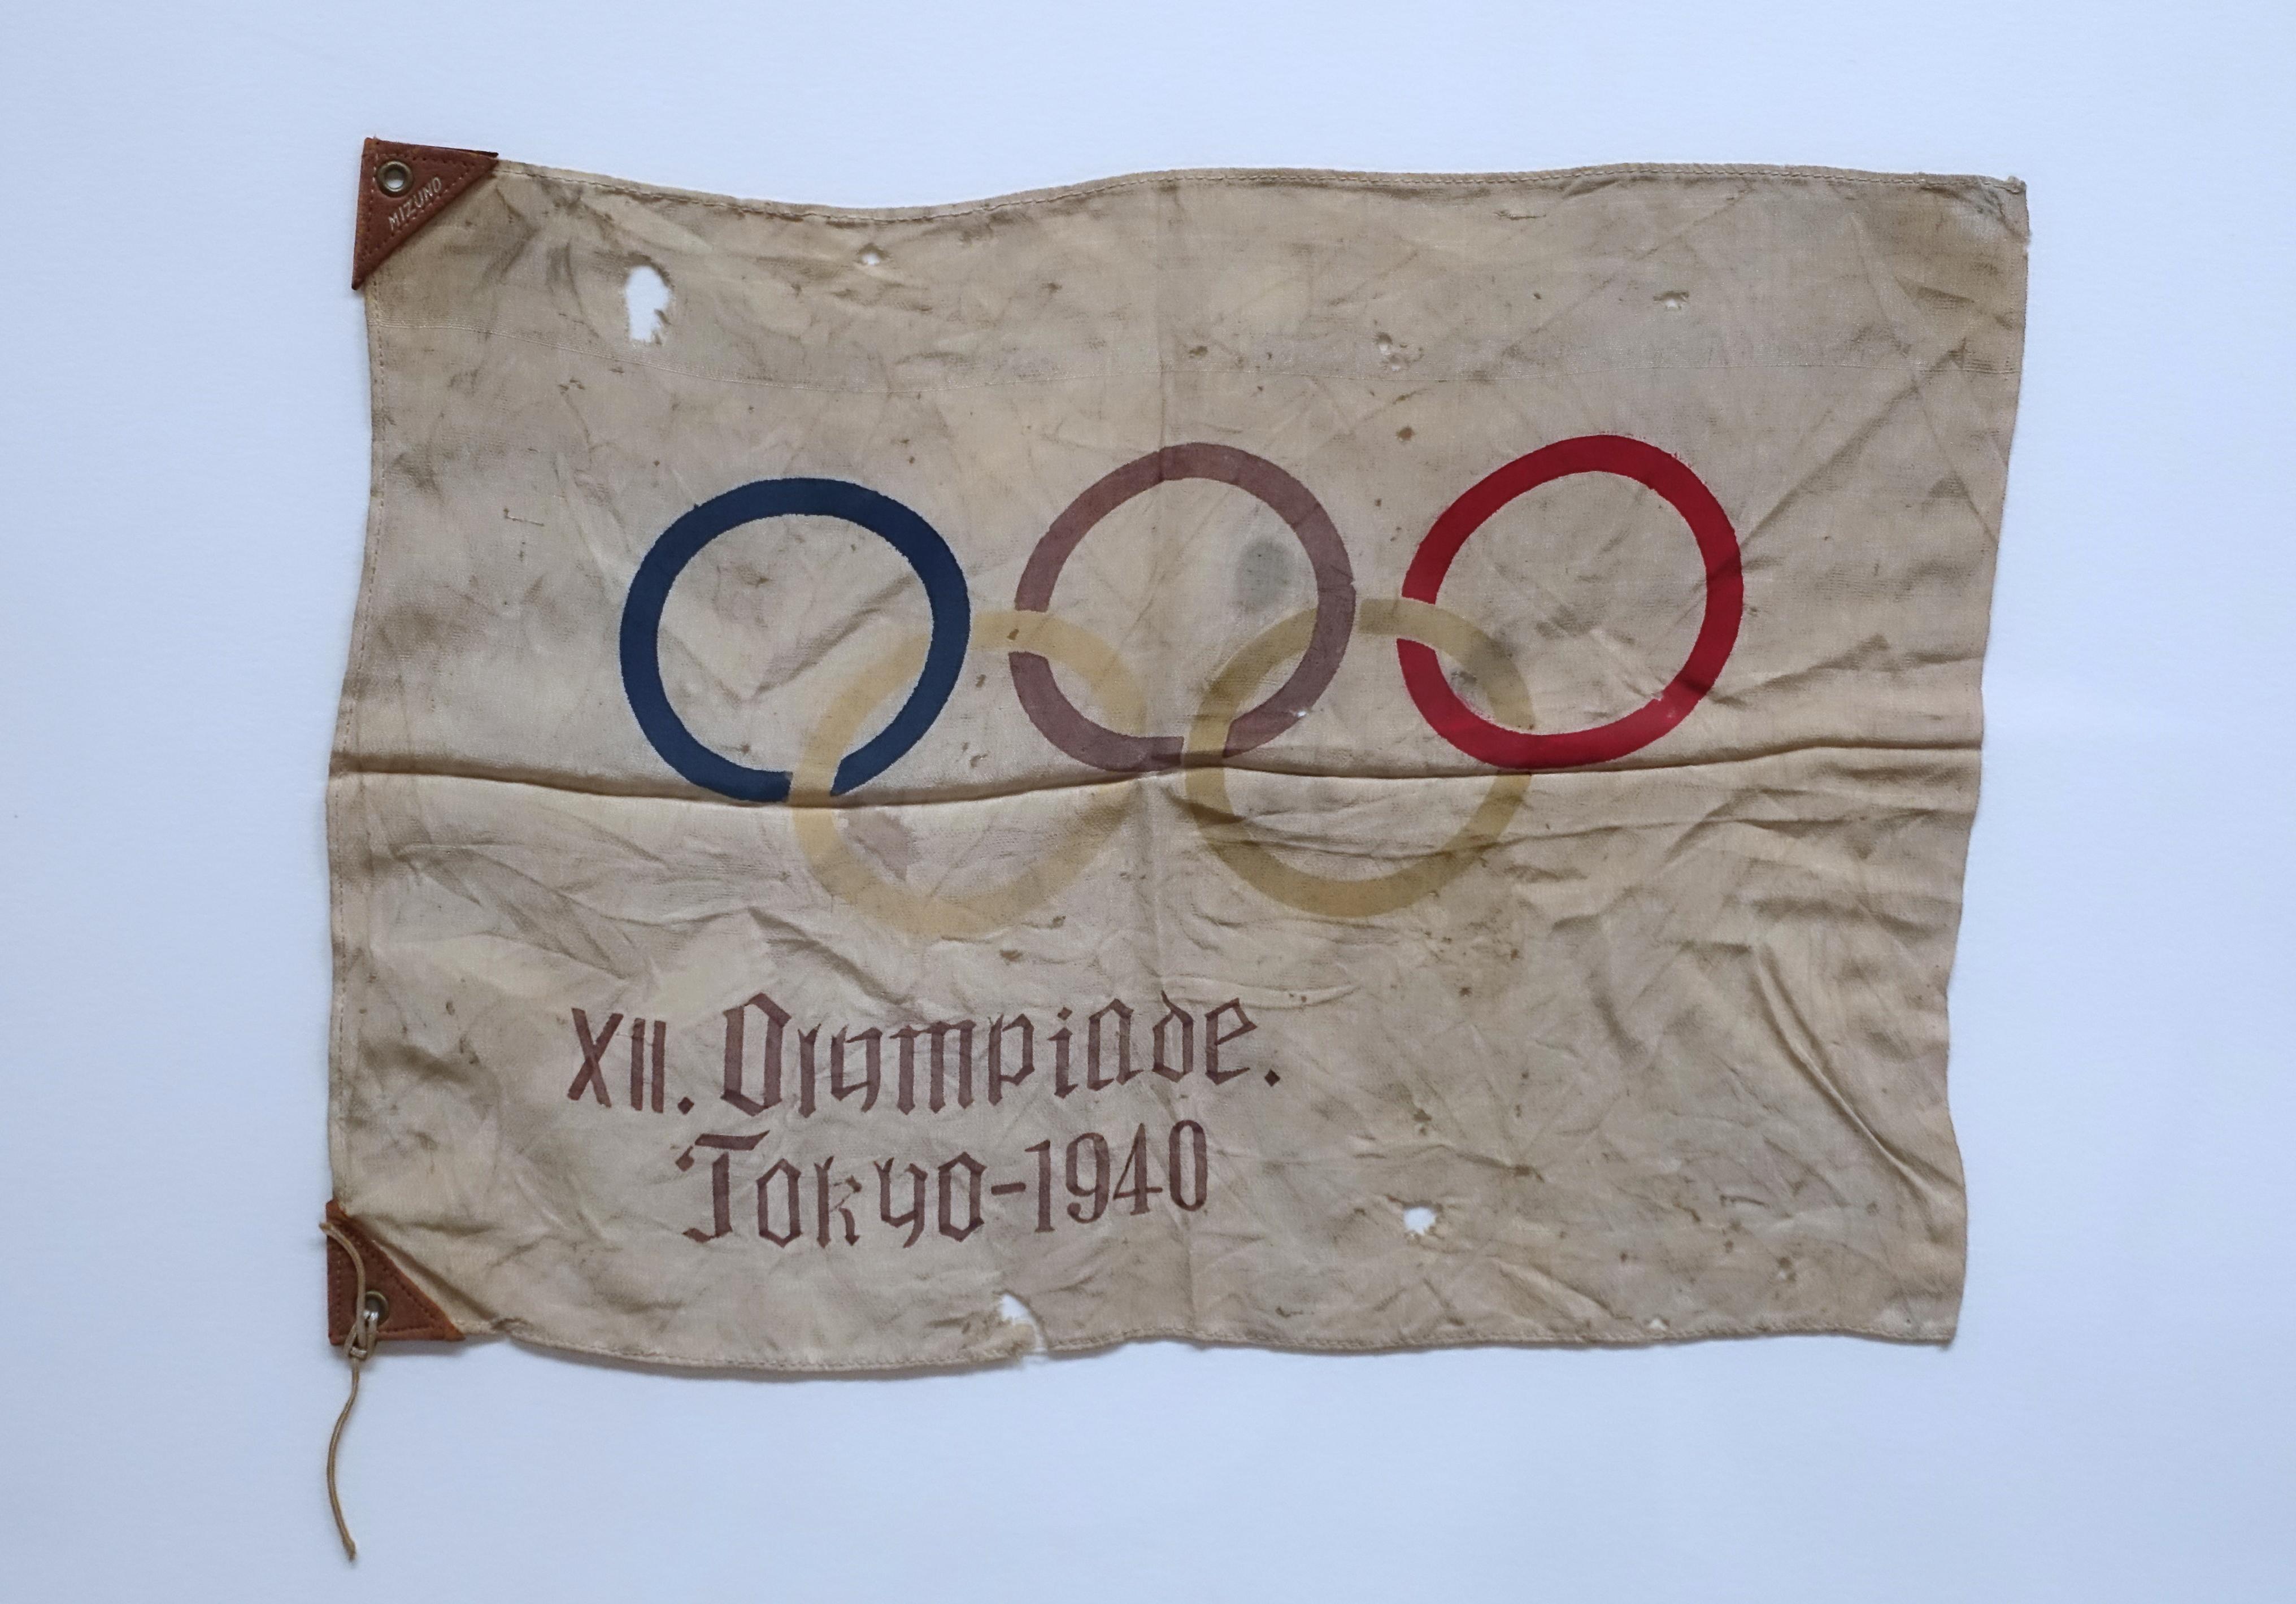 1940 Summer Olympics - Wikipedia